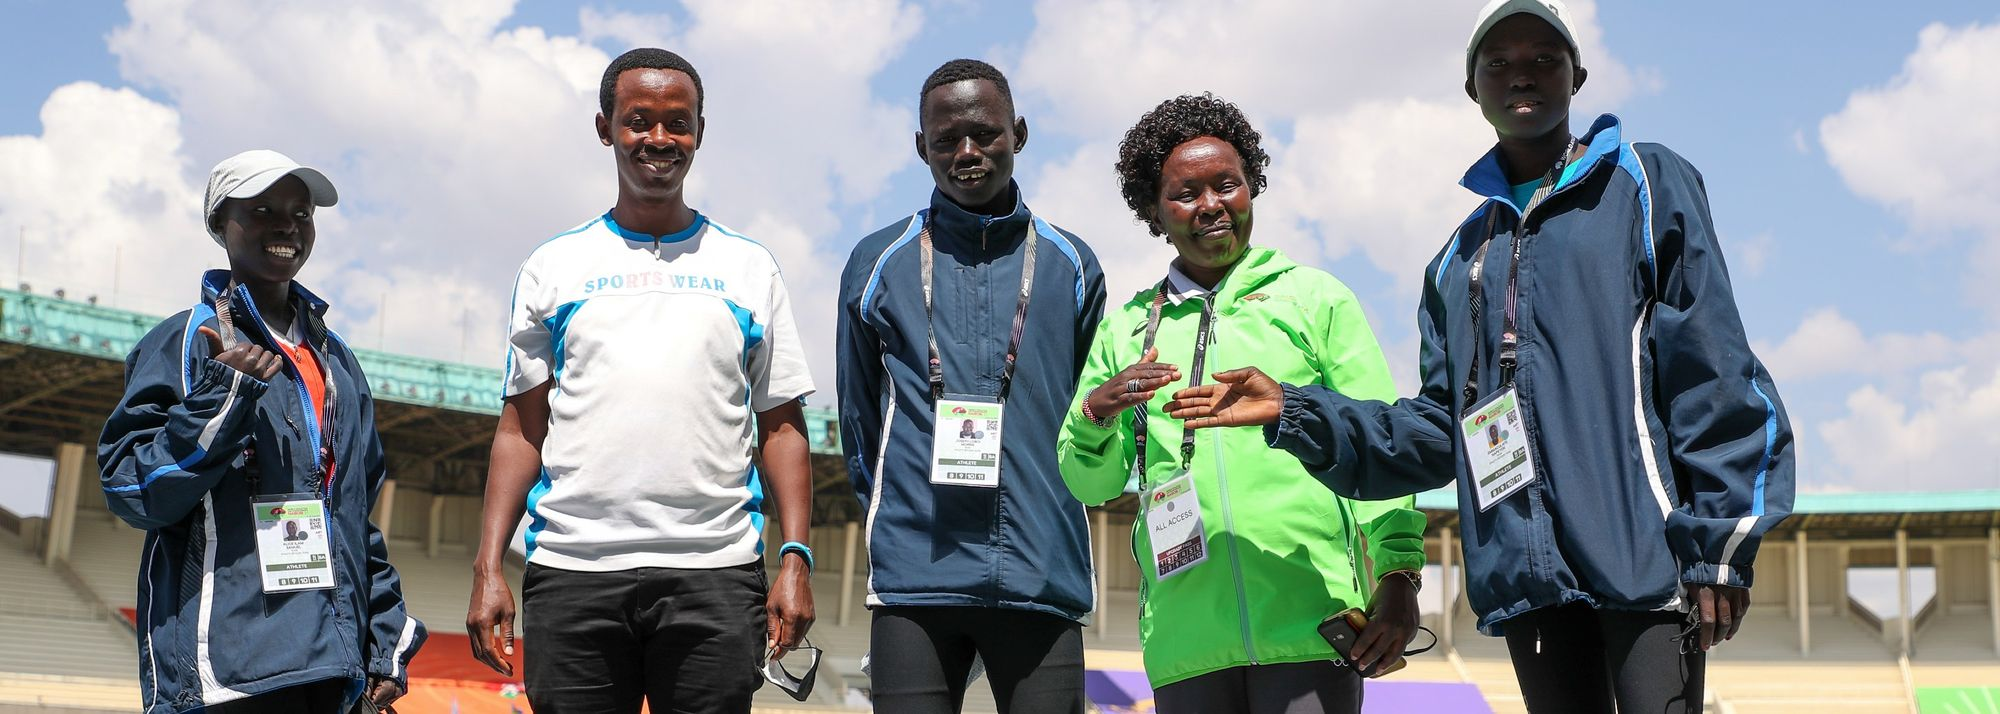 The World U20 Championships dream came true for Joseph Loboi Morris, Emmaculate Napeyok and Alice IIam Samuel.